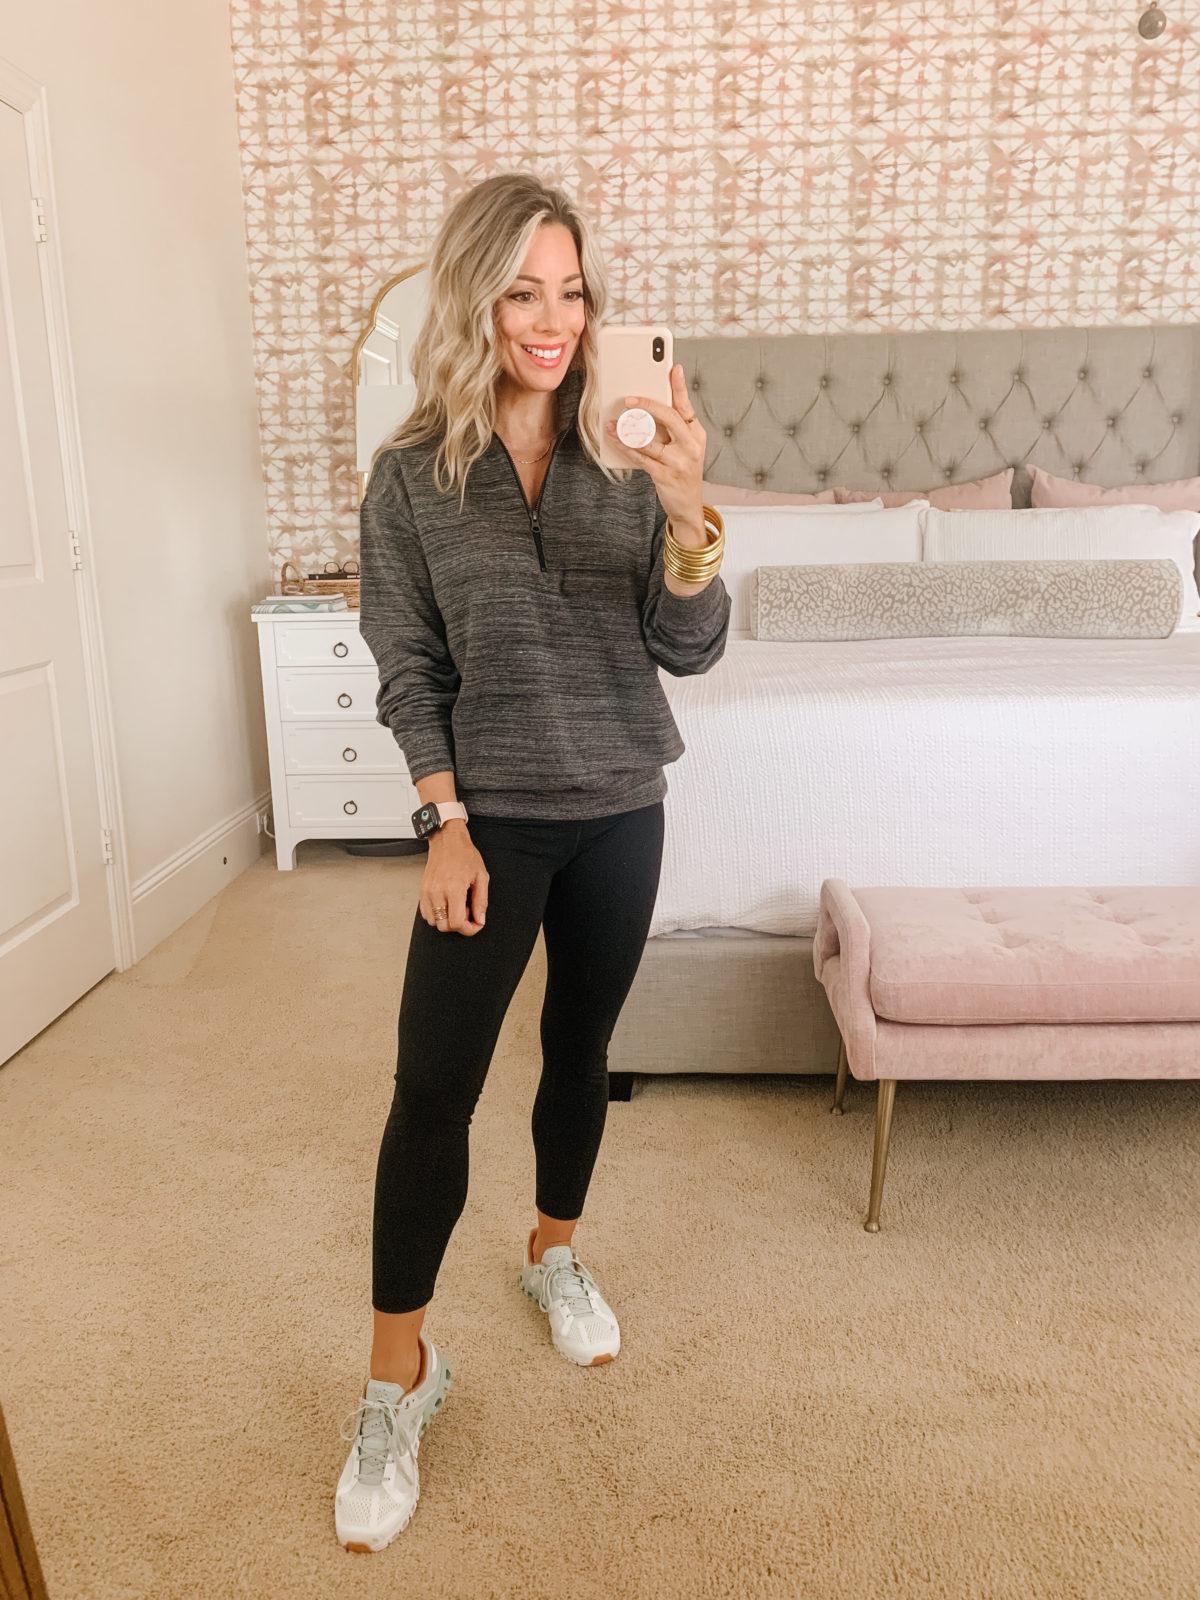 Amazon Fashion Finds, Sweatshirt, Leggings, Sneakers